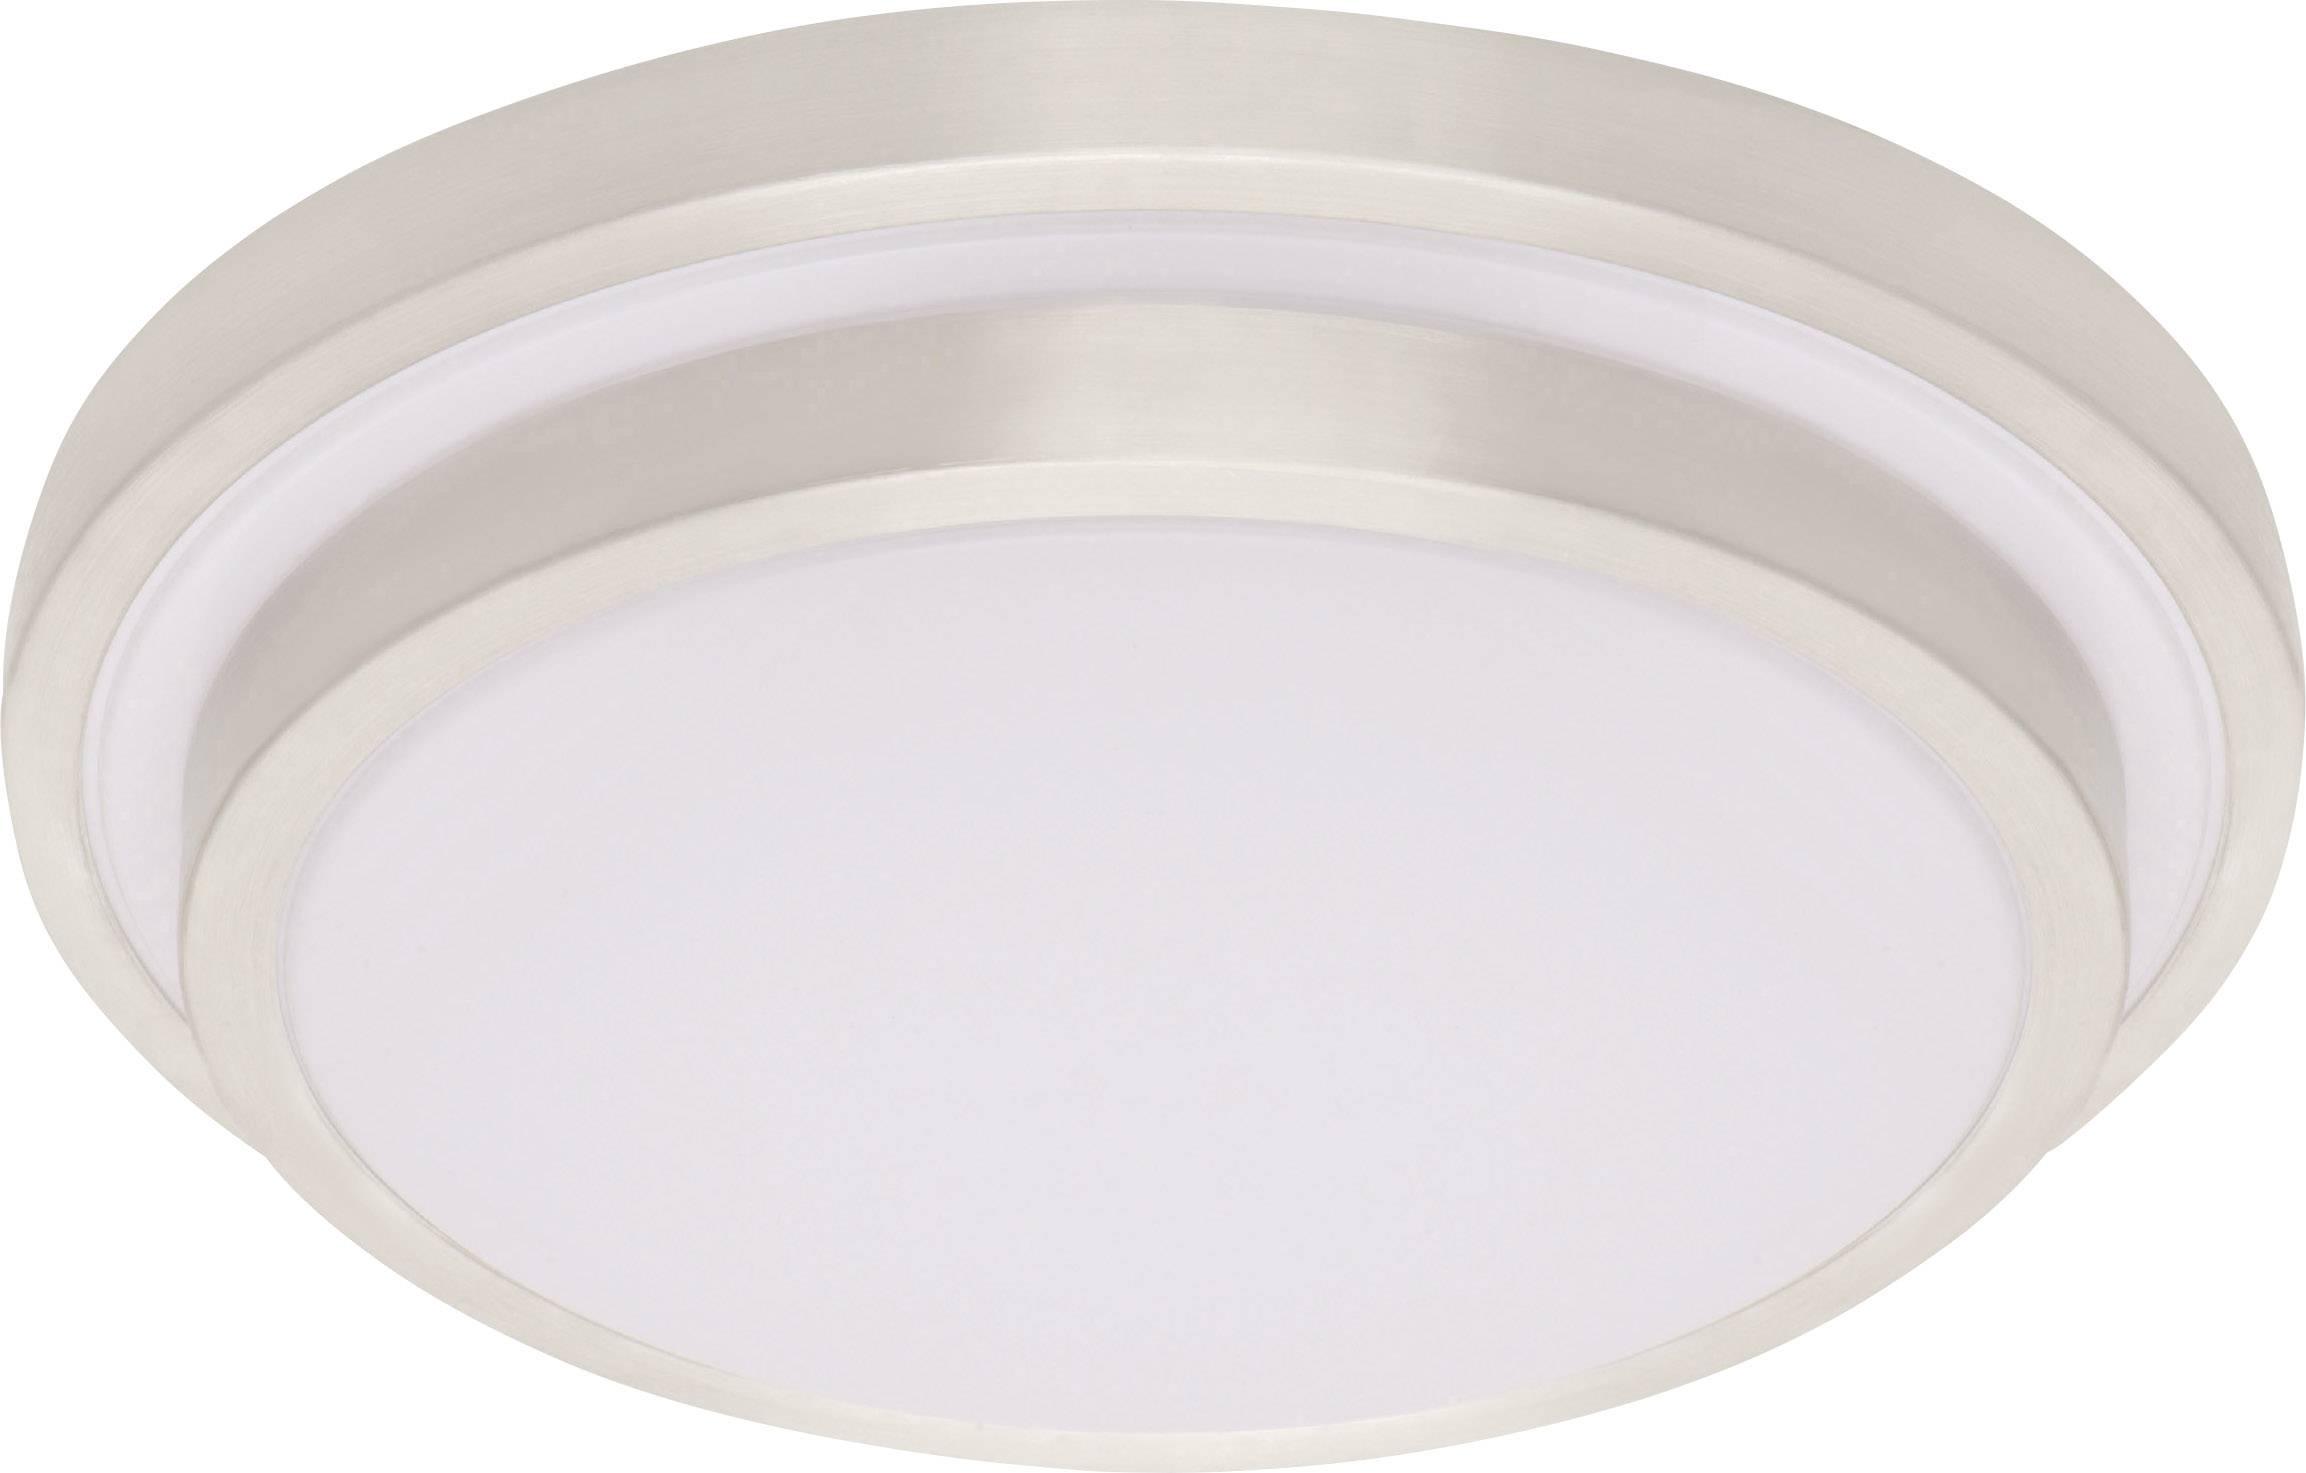 Badkamer Plafondlamp Led : Led plafondlamp voor badkamer w warm wit brilliant g